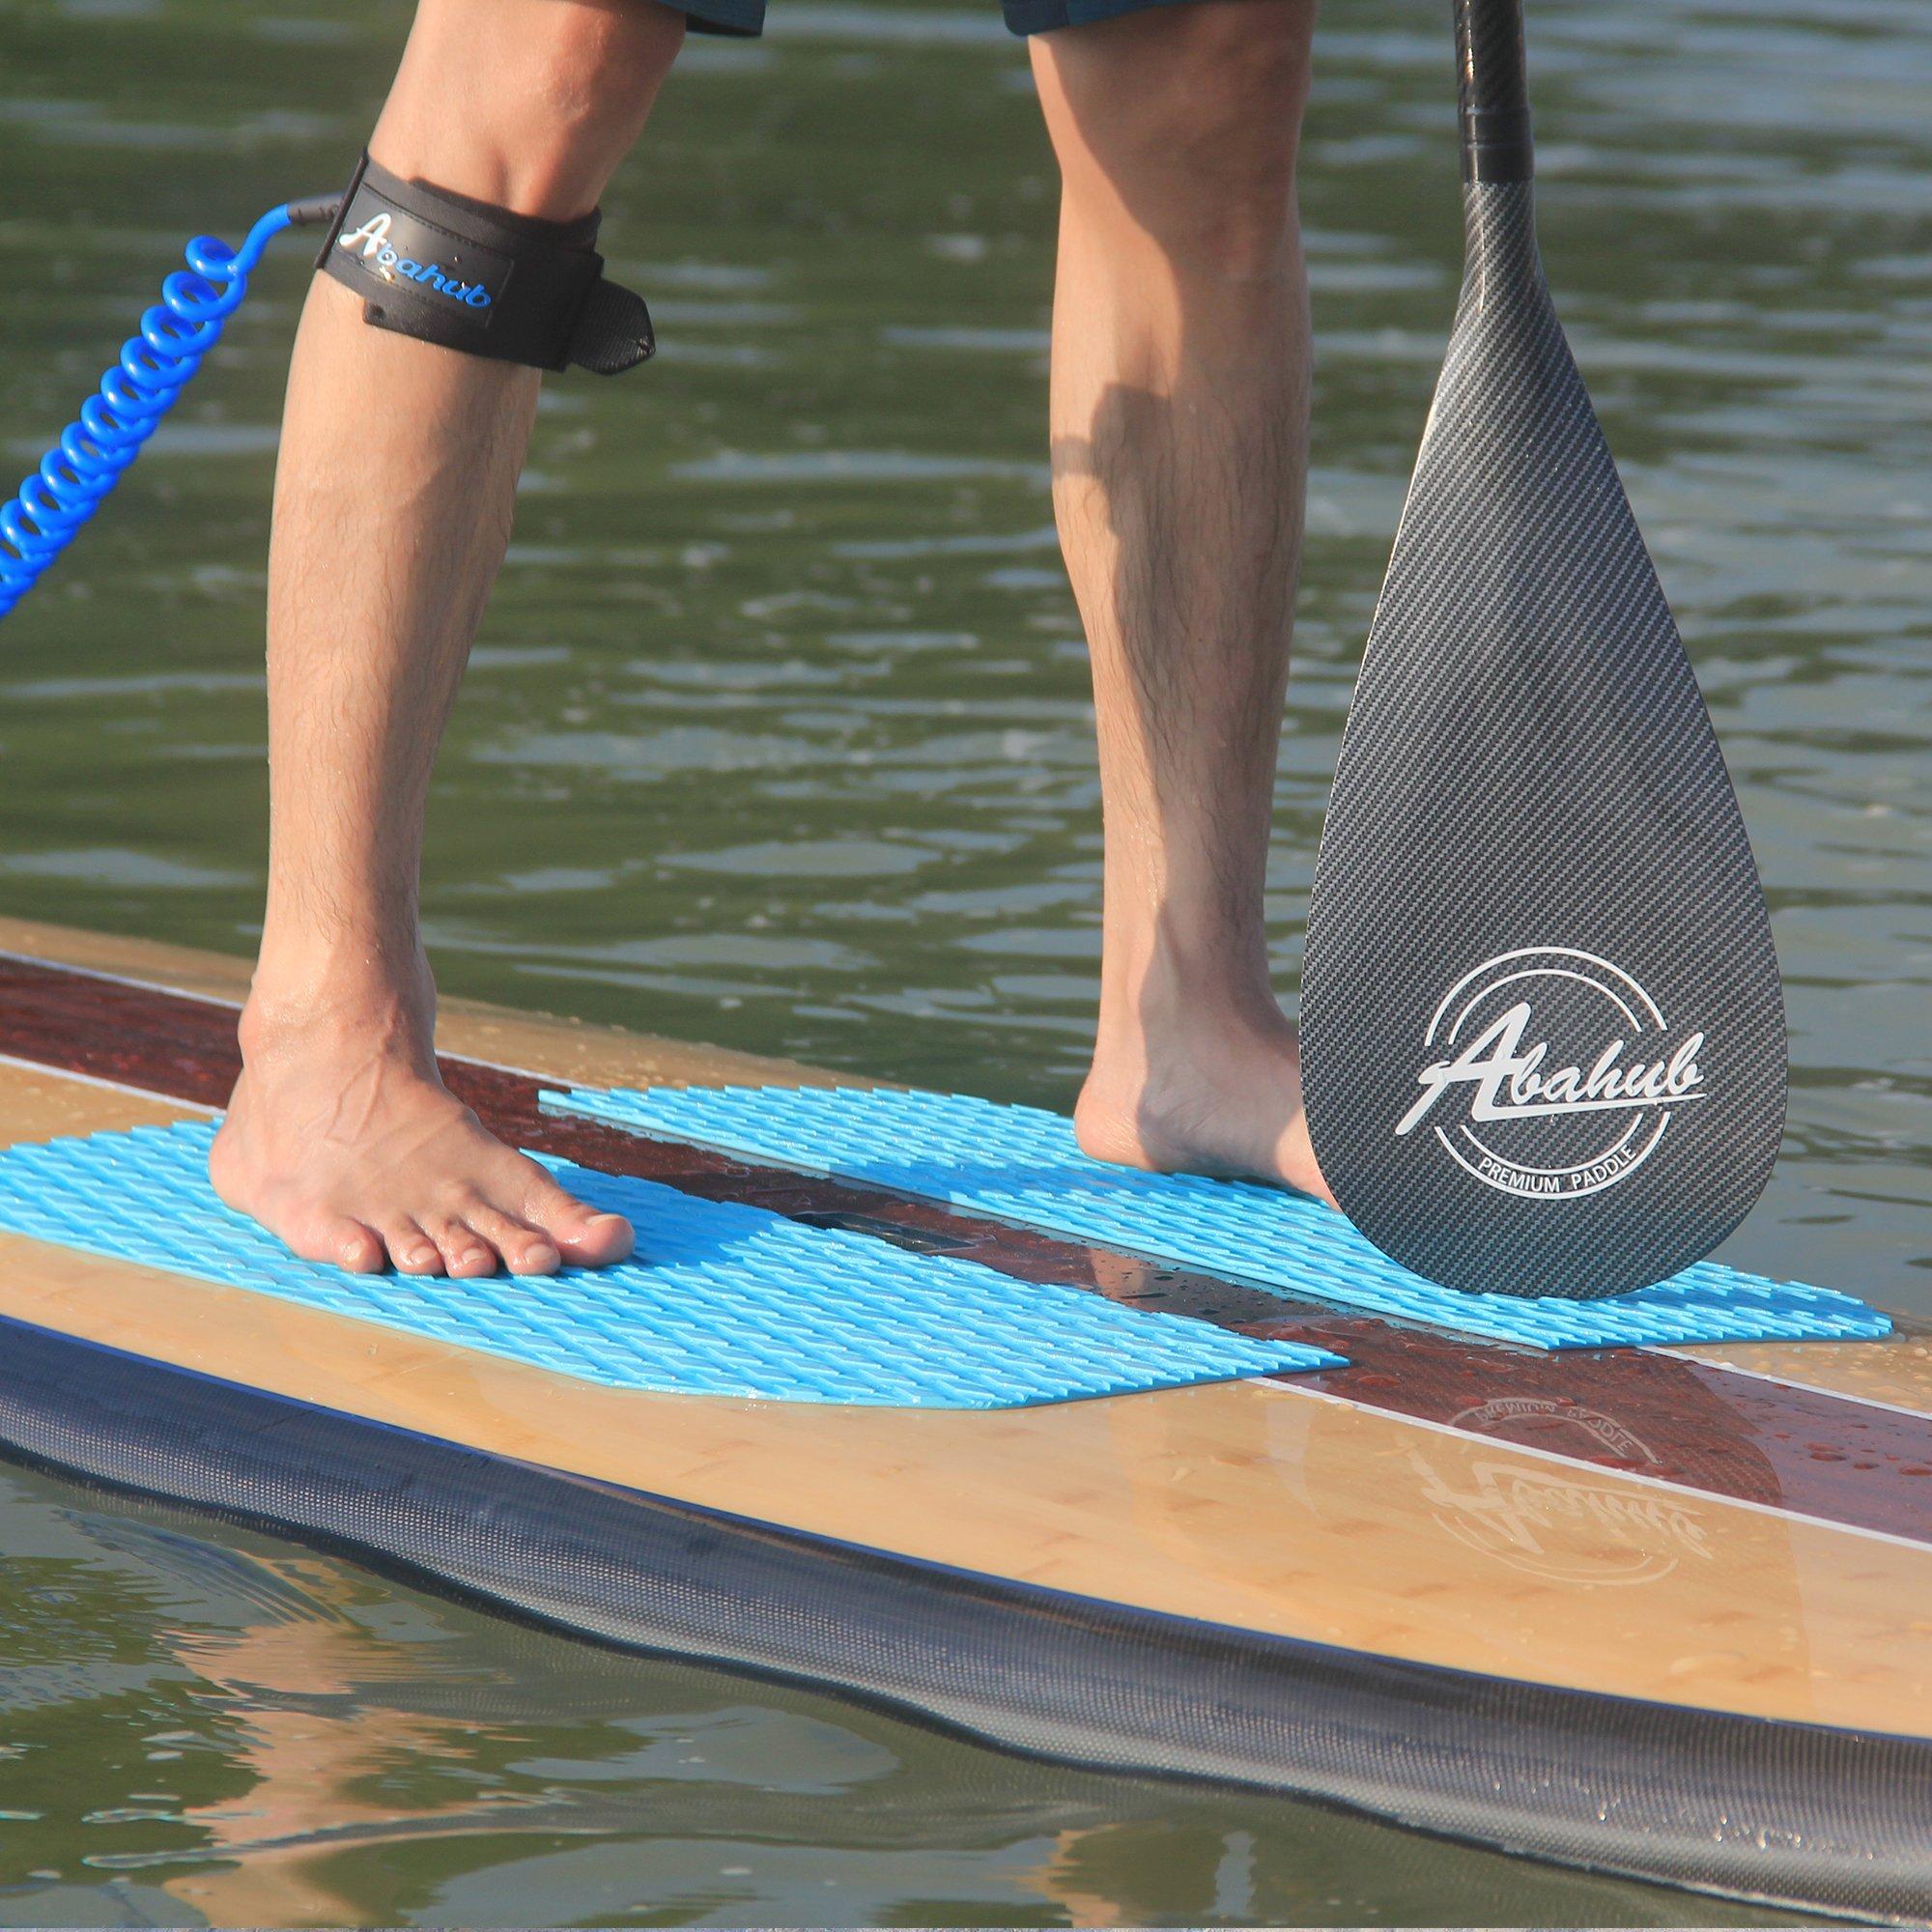 ABAHUB 3-Piece Adjustable Carbon Fiber SUP Paddle Carbon Shaft Carbon Print Plastic Blade + Bag by ABAHUB (Image #3)